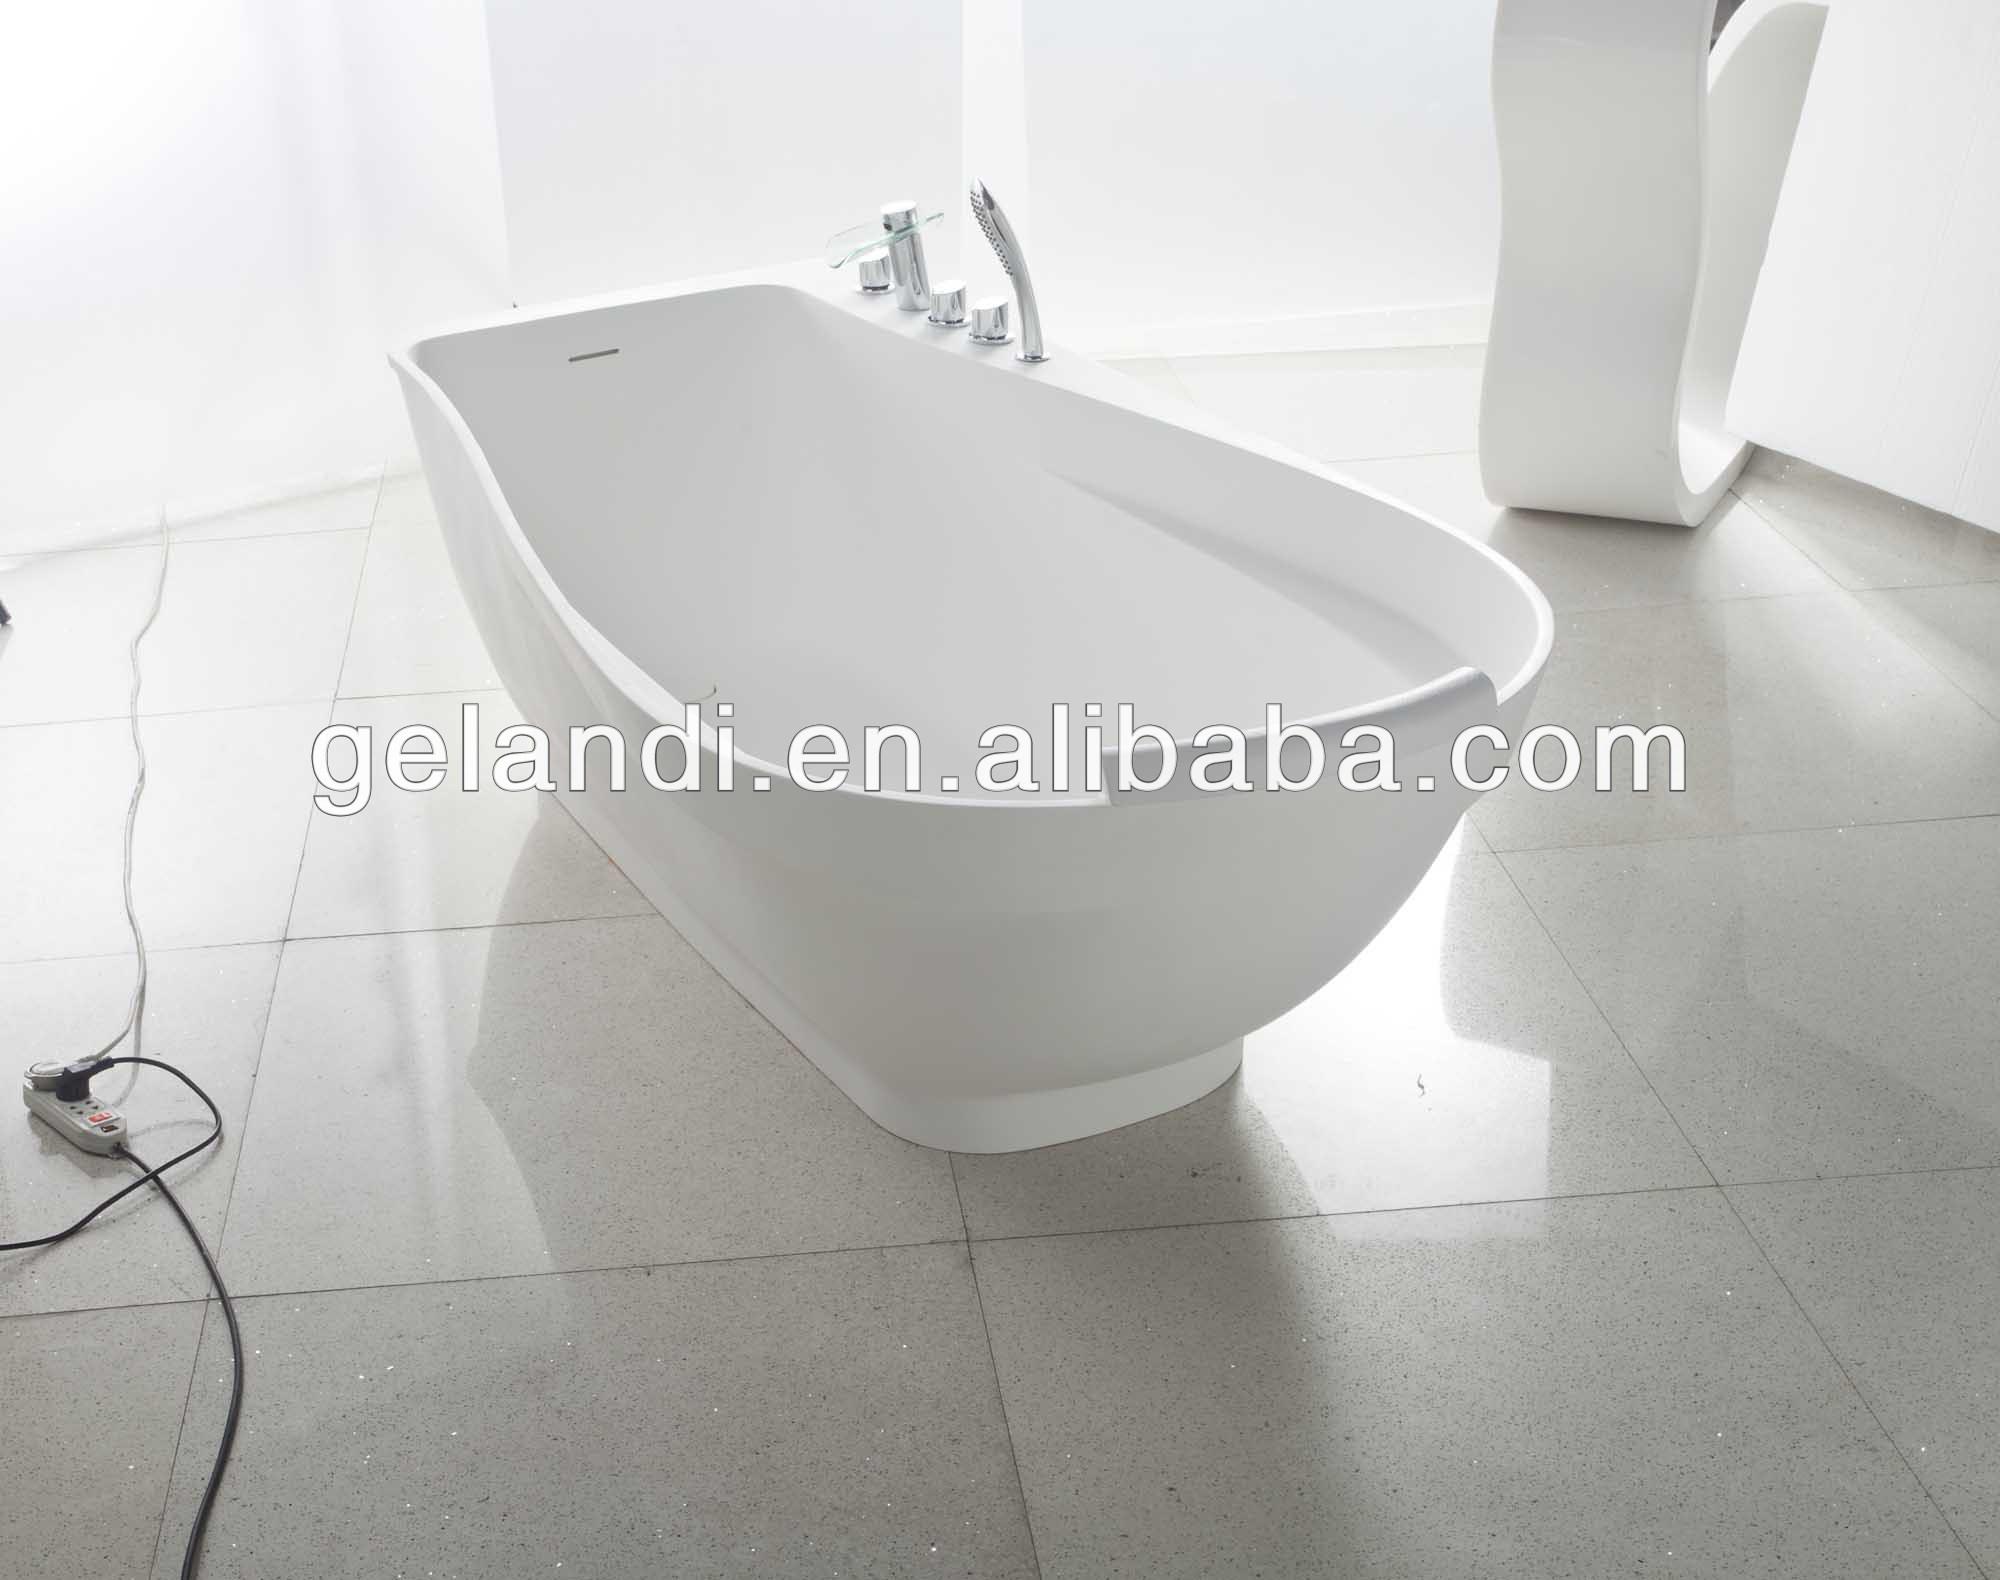 modern economic china bath tubs free standing bathtubs buy bathtubs free s. Black Bedroom Furniture Sets. Home Design Ideas